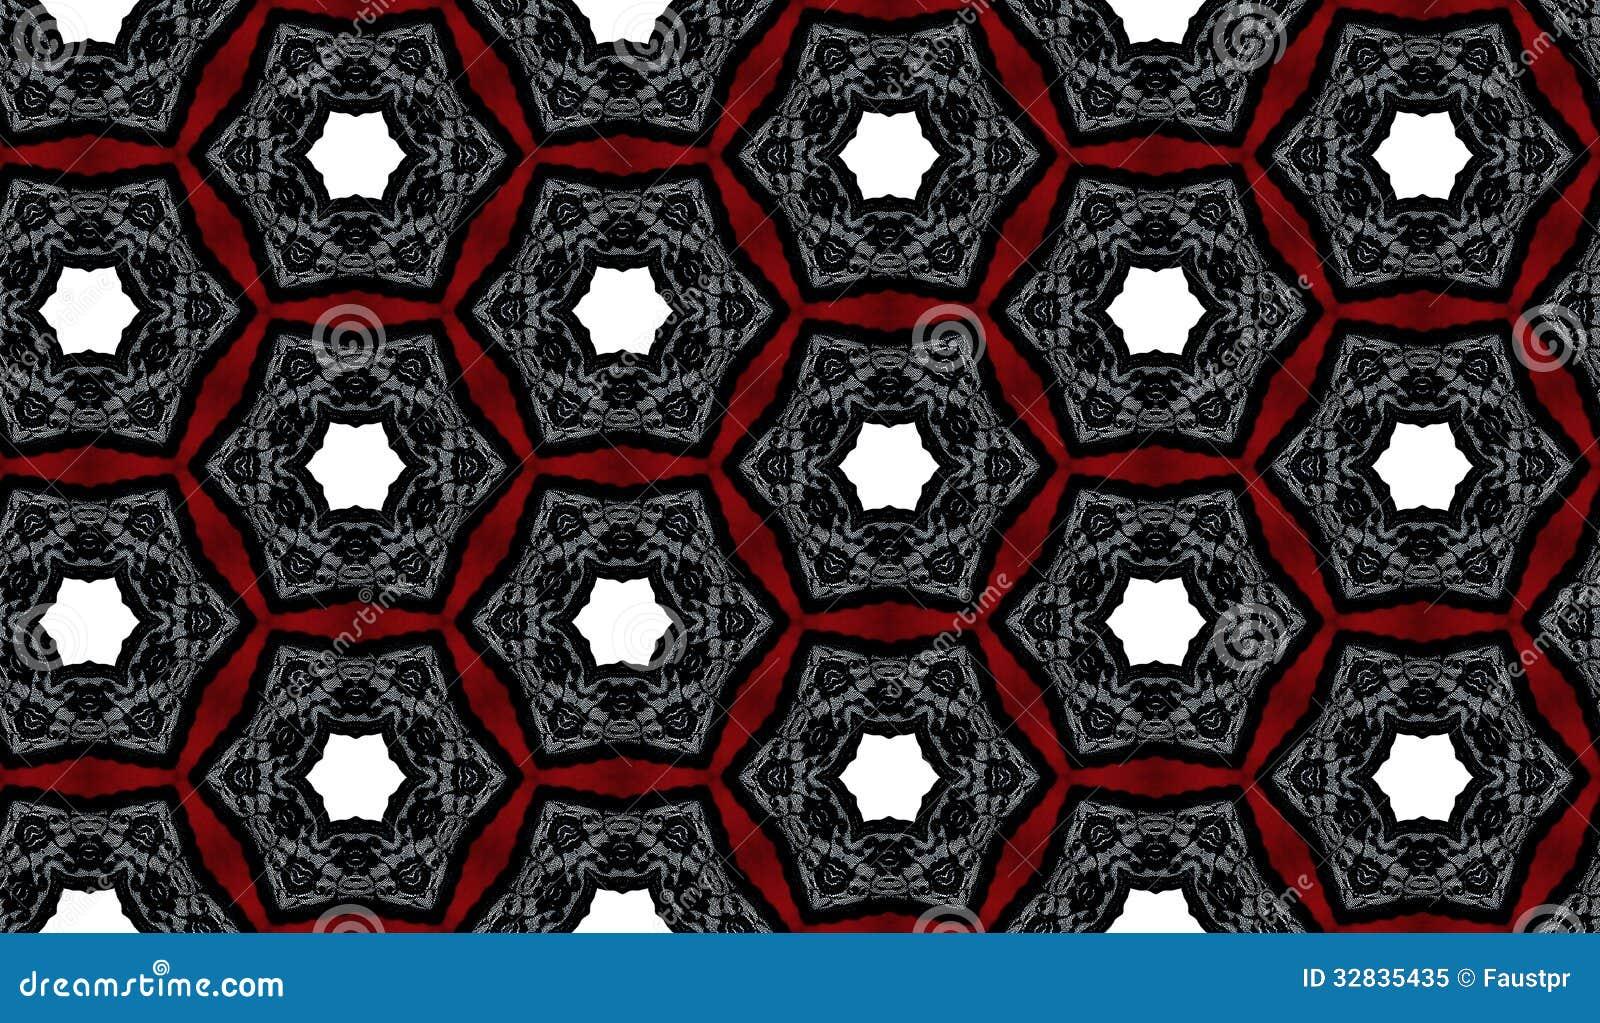 lace background tile - photo #17